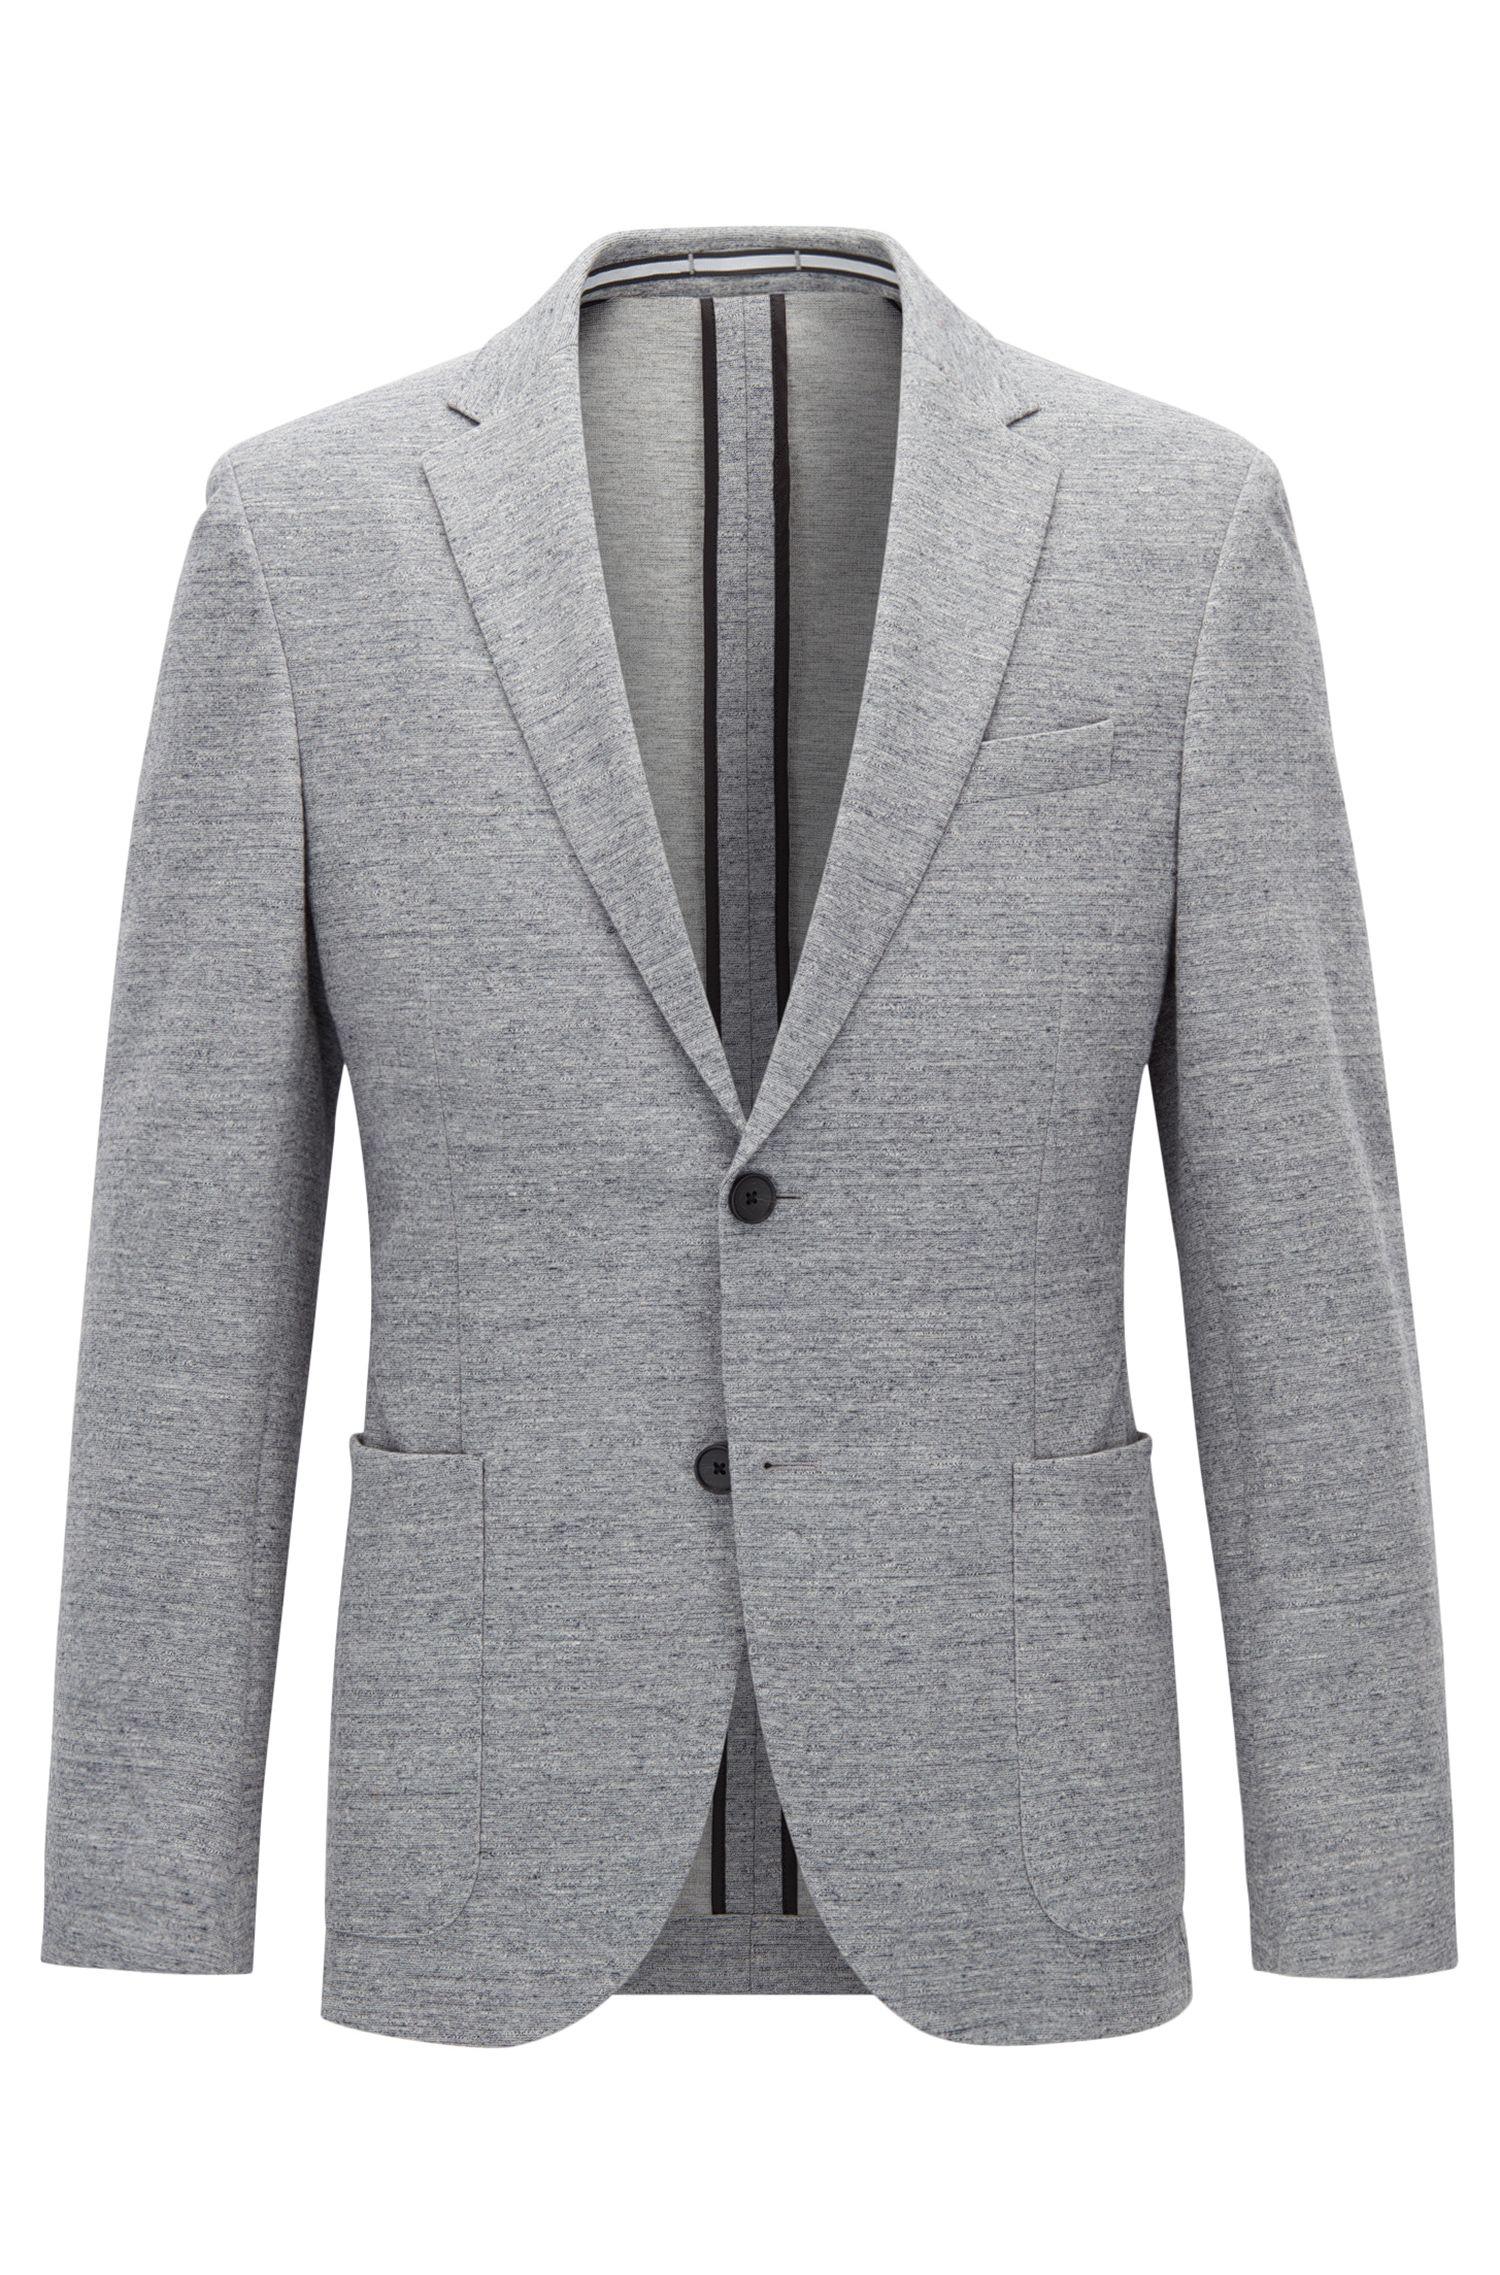 Jersey blend Tweed Sport Coat, Slim Fit | Newon J